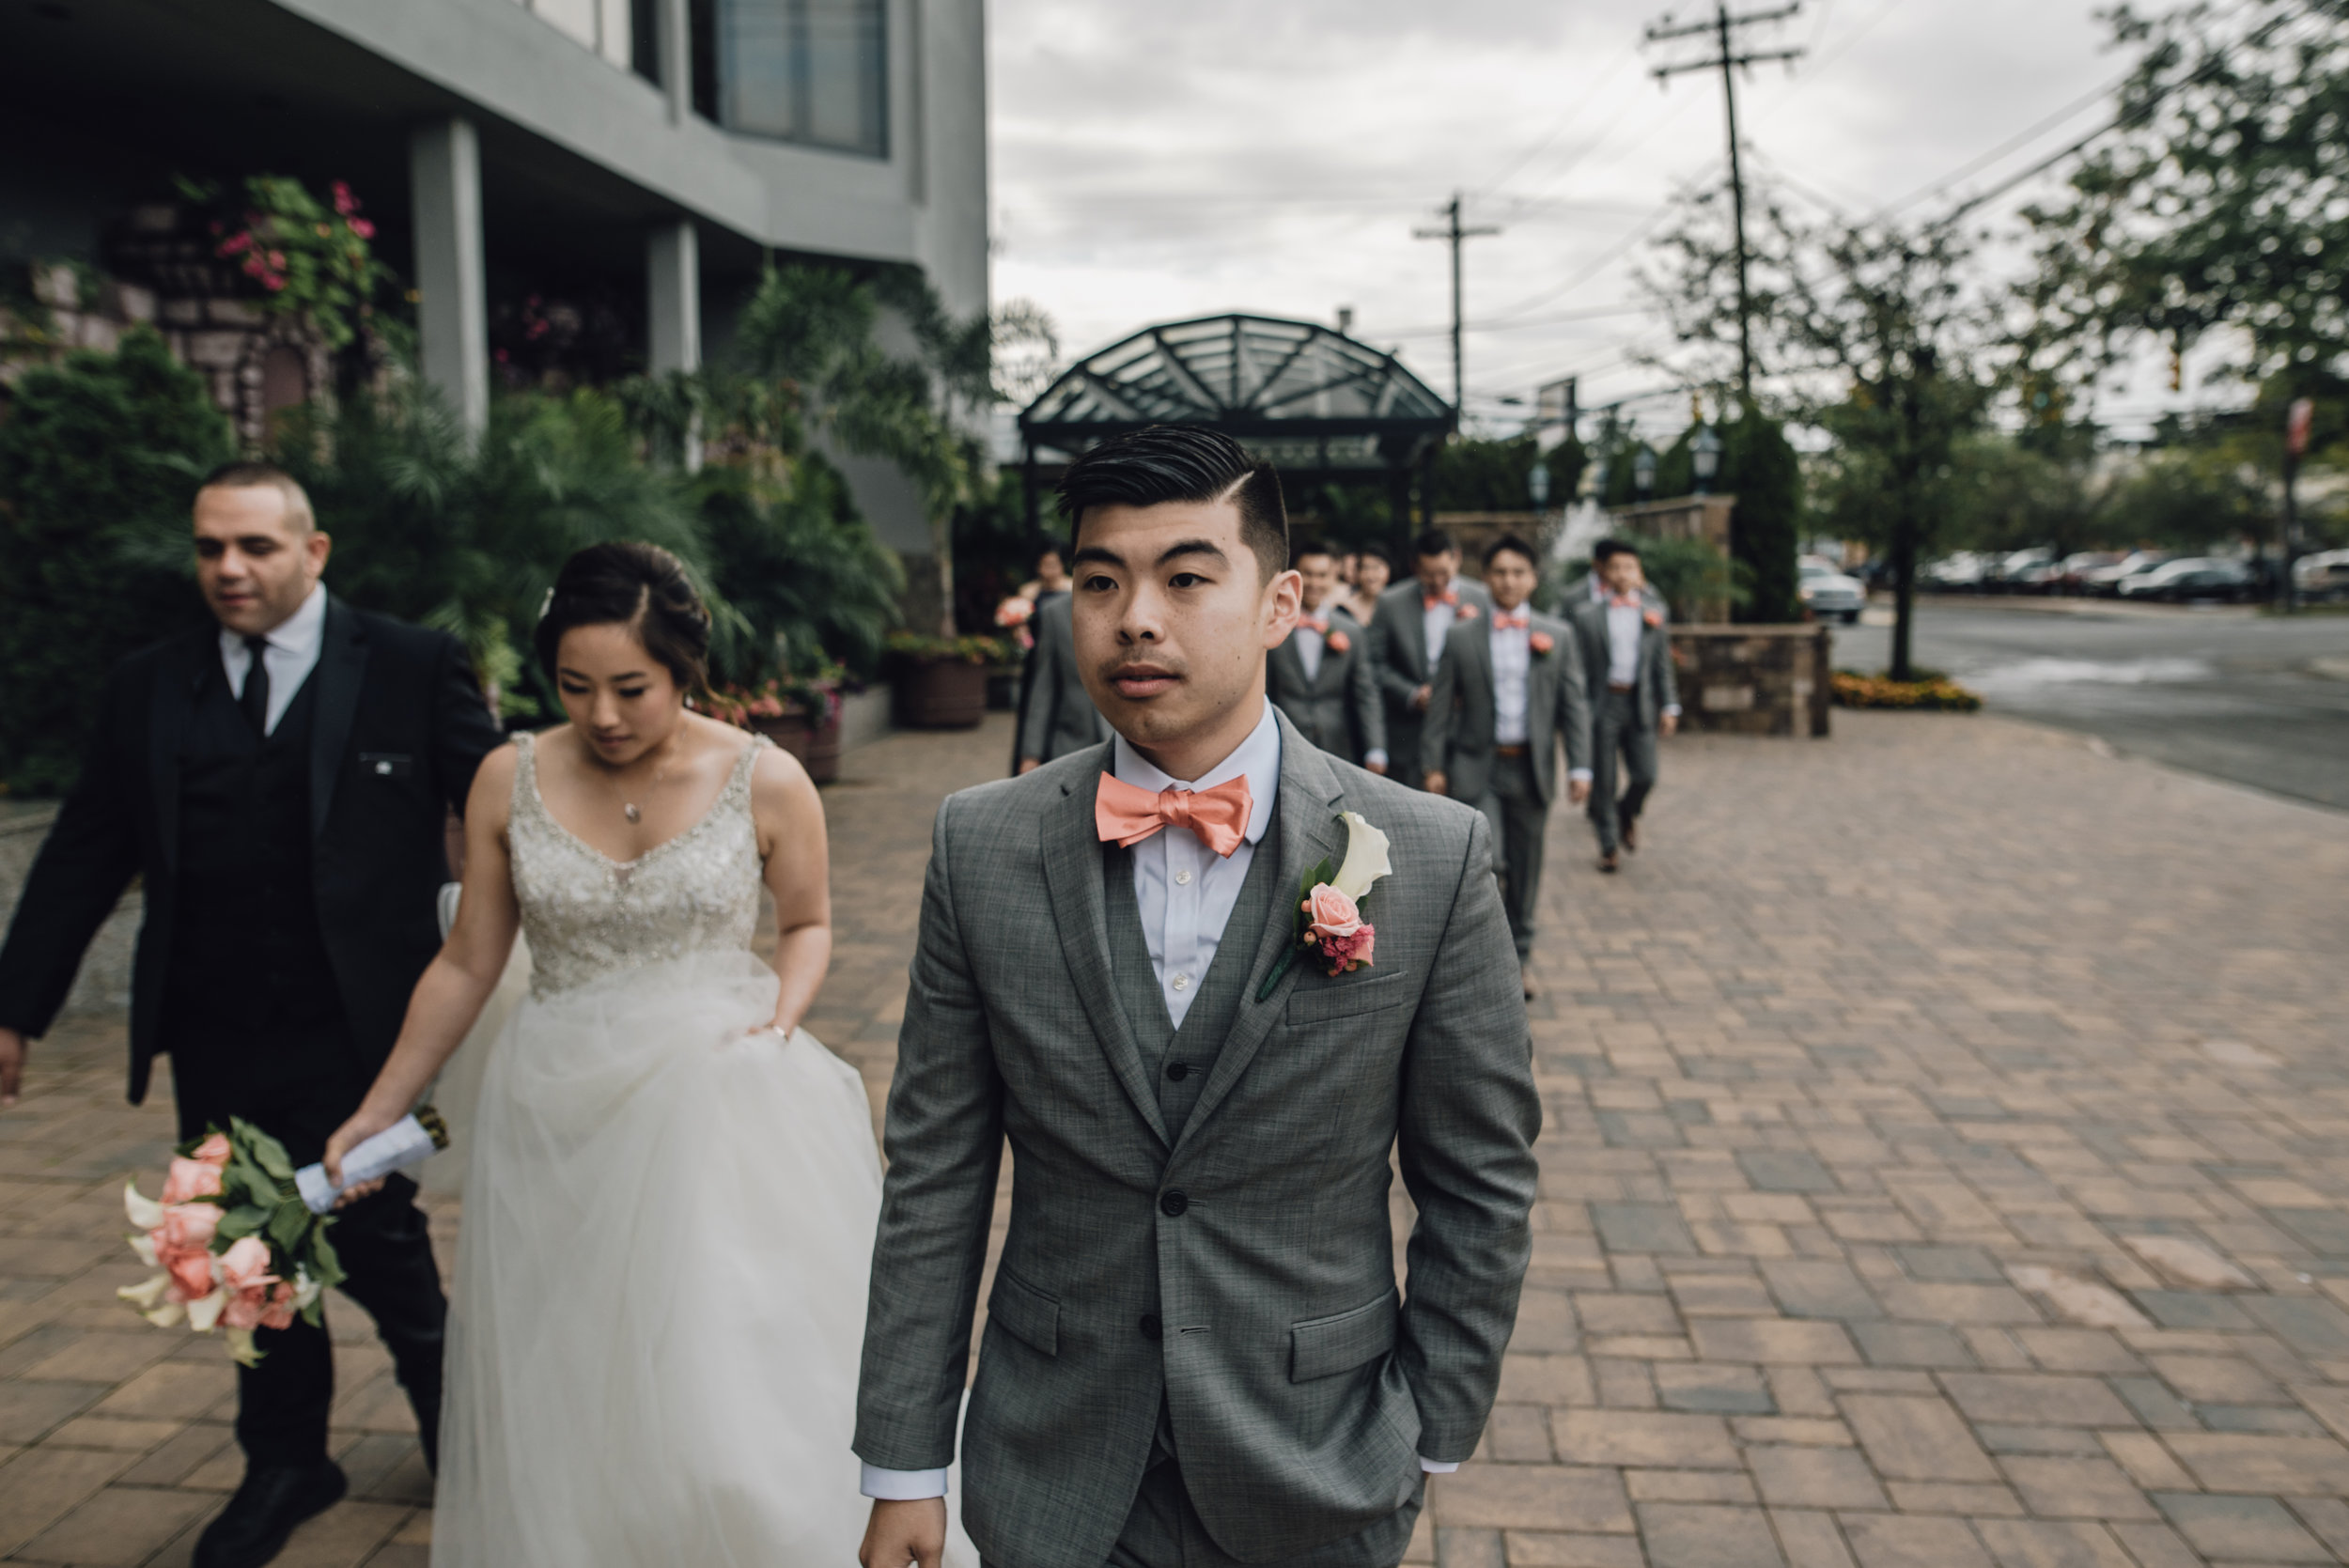 Main and Simple Photography_2017_Weddings_NewYork_TinaJon-586.jpg